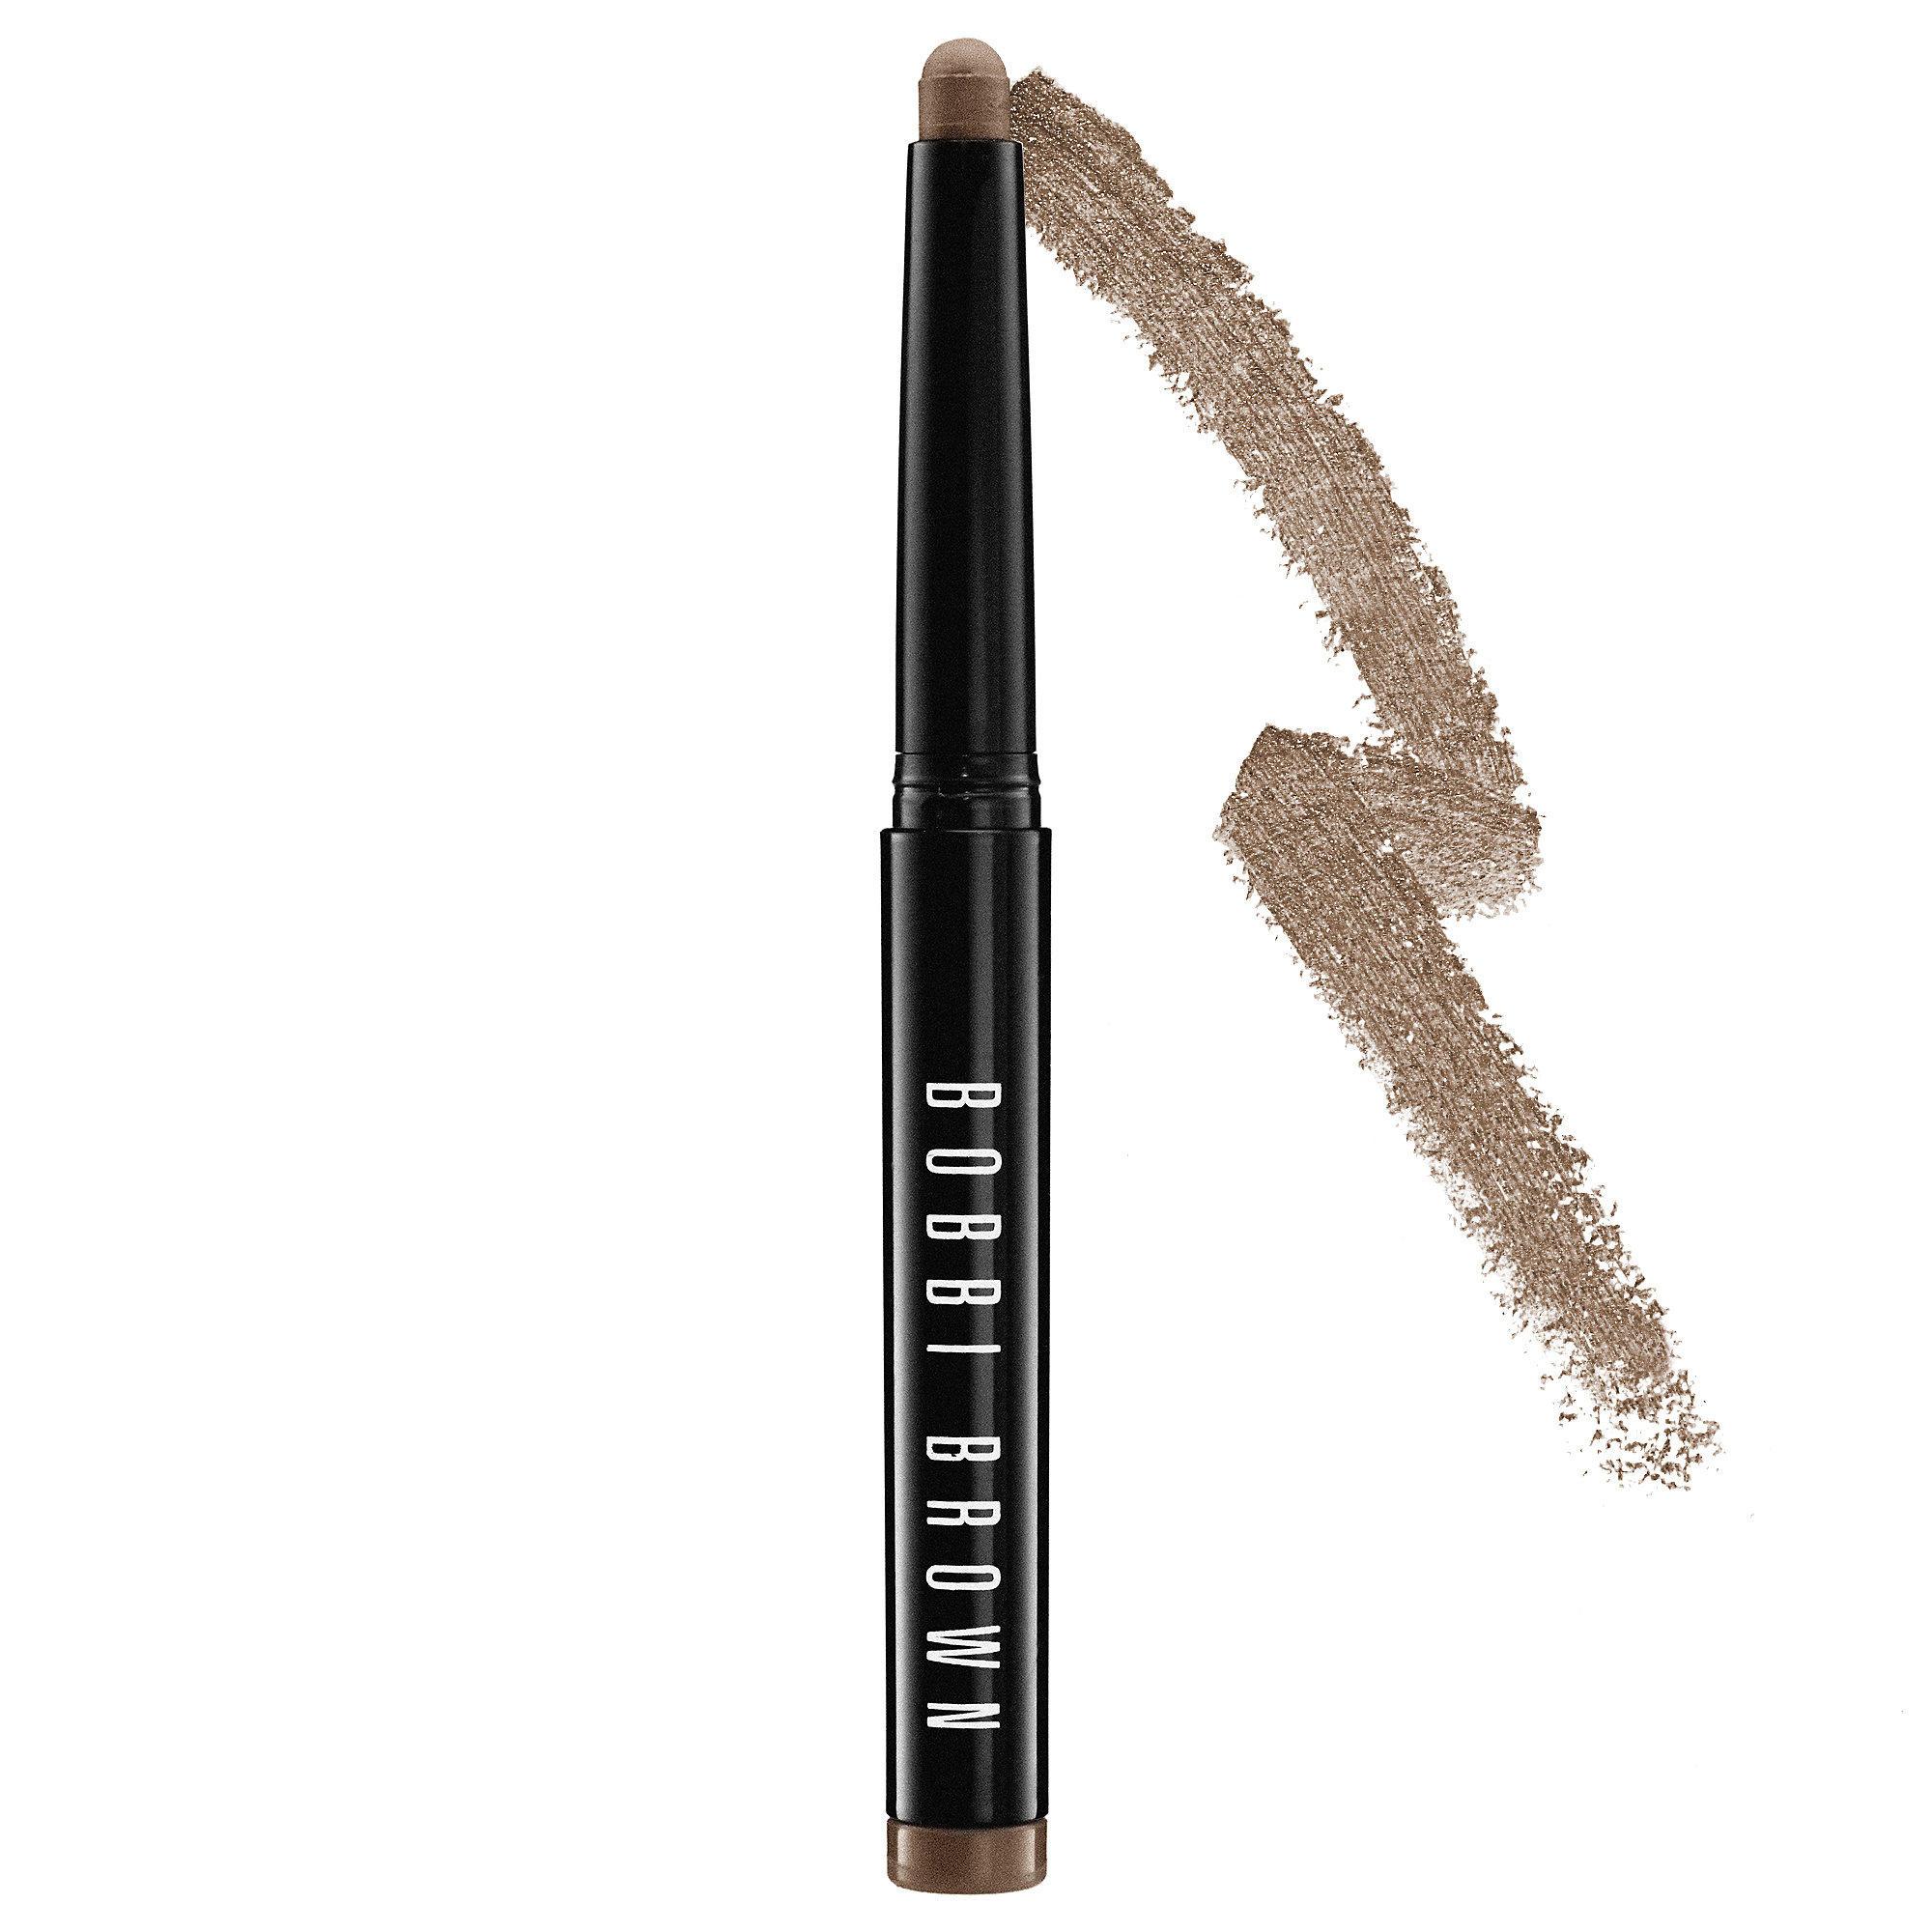 Bobbi Brown Long-Wear Cream Shadow Stick Stone 37